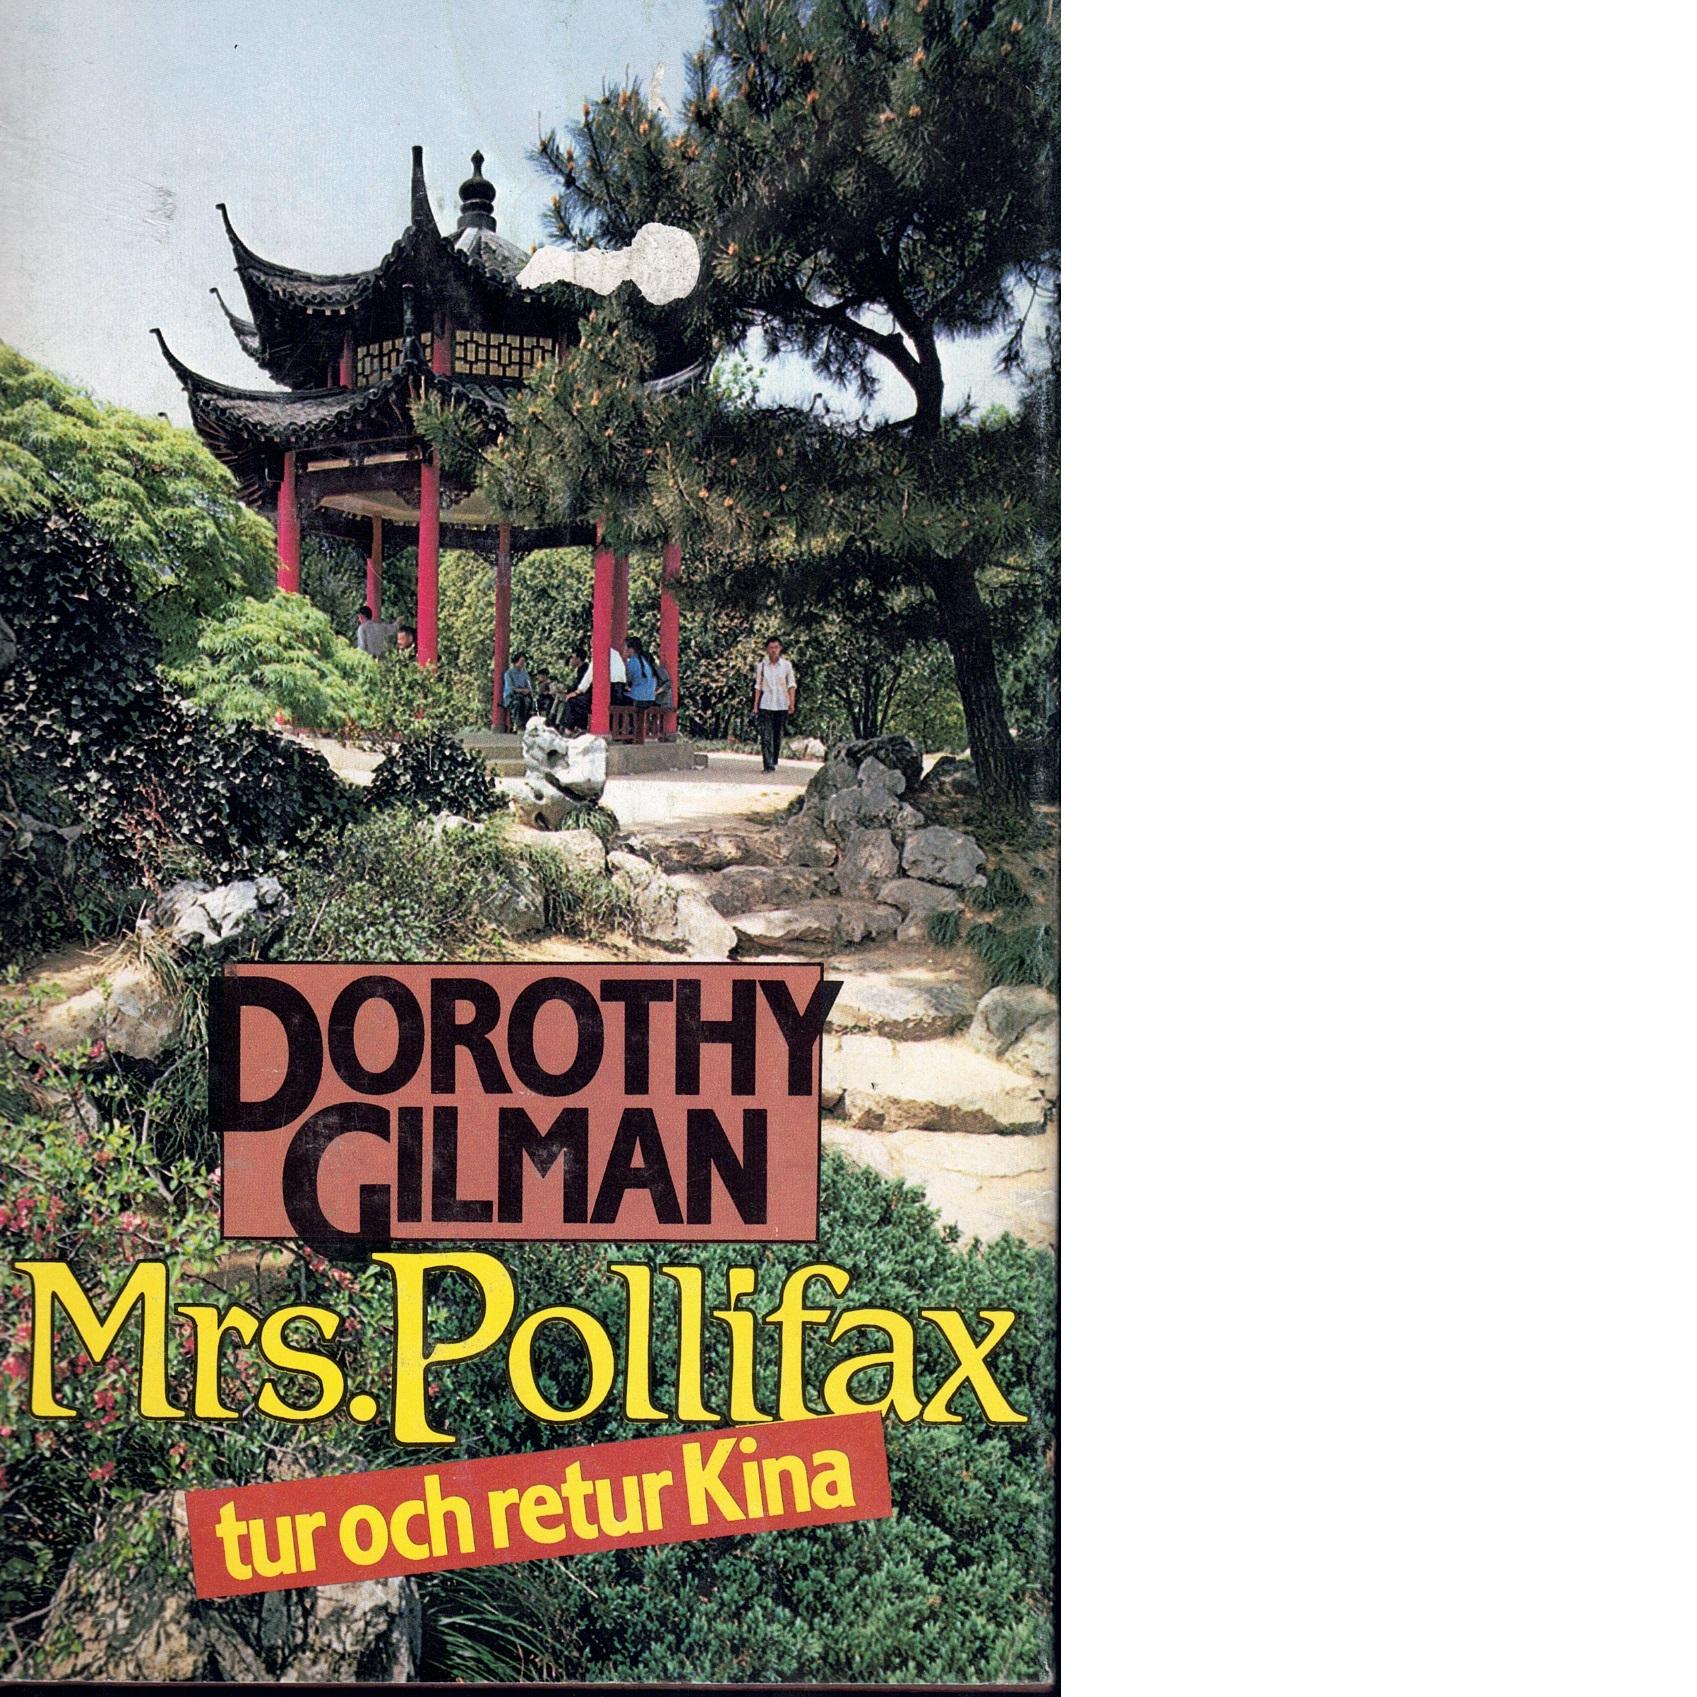 Mrs. Pollifax tur och retur Kina - Gilman, Dorothy